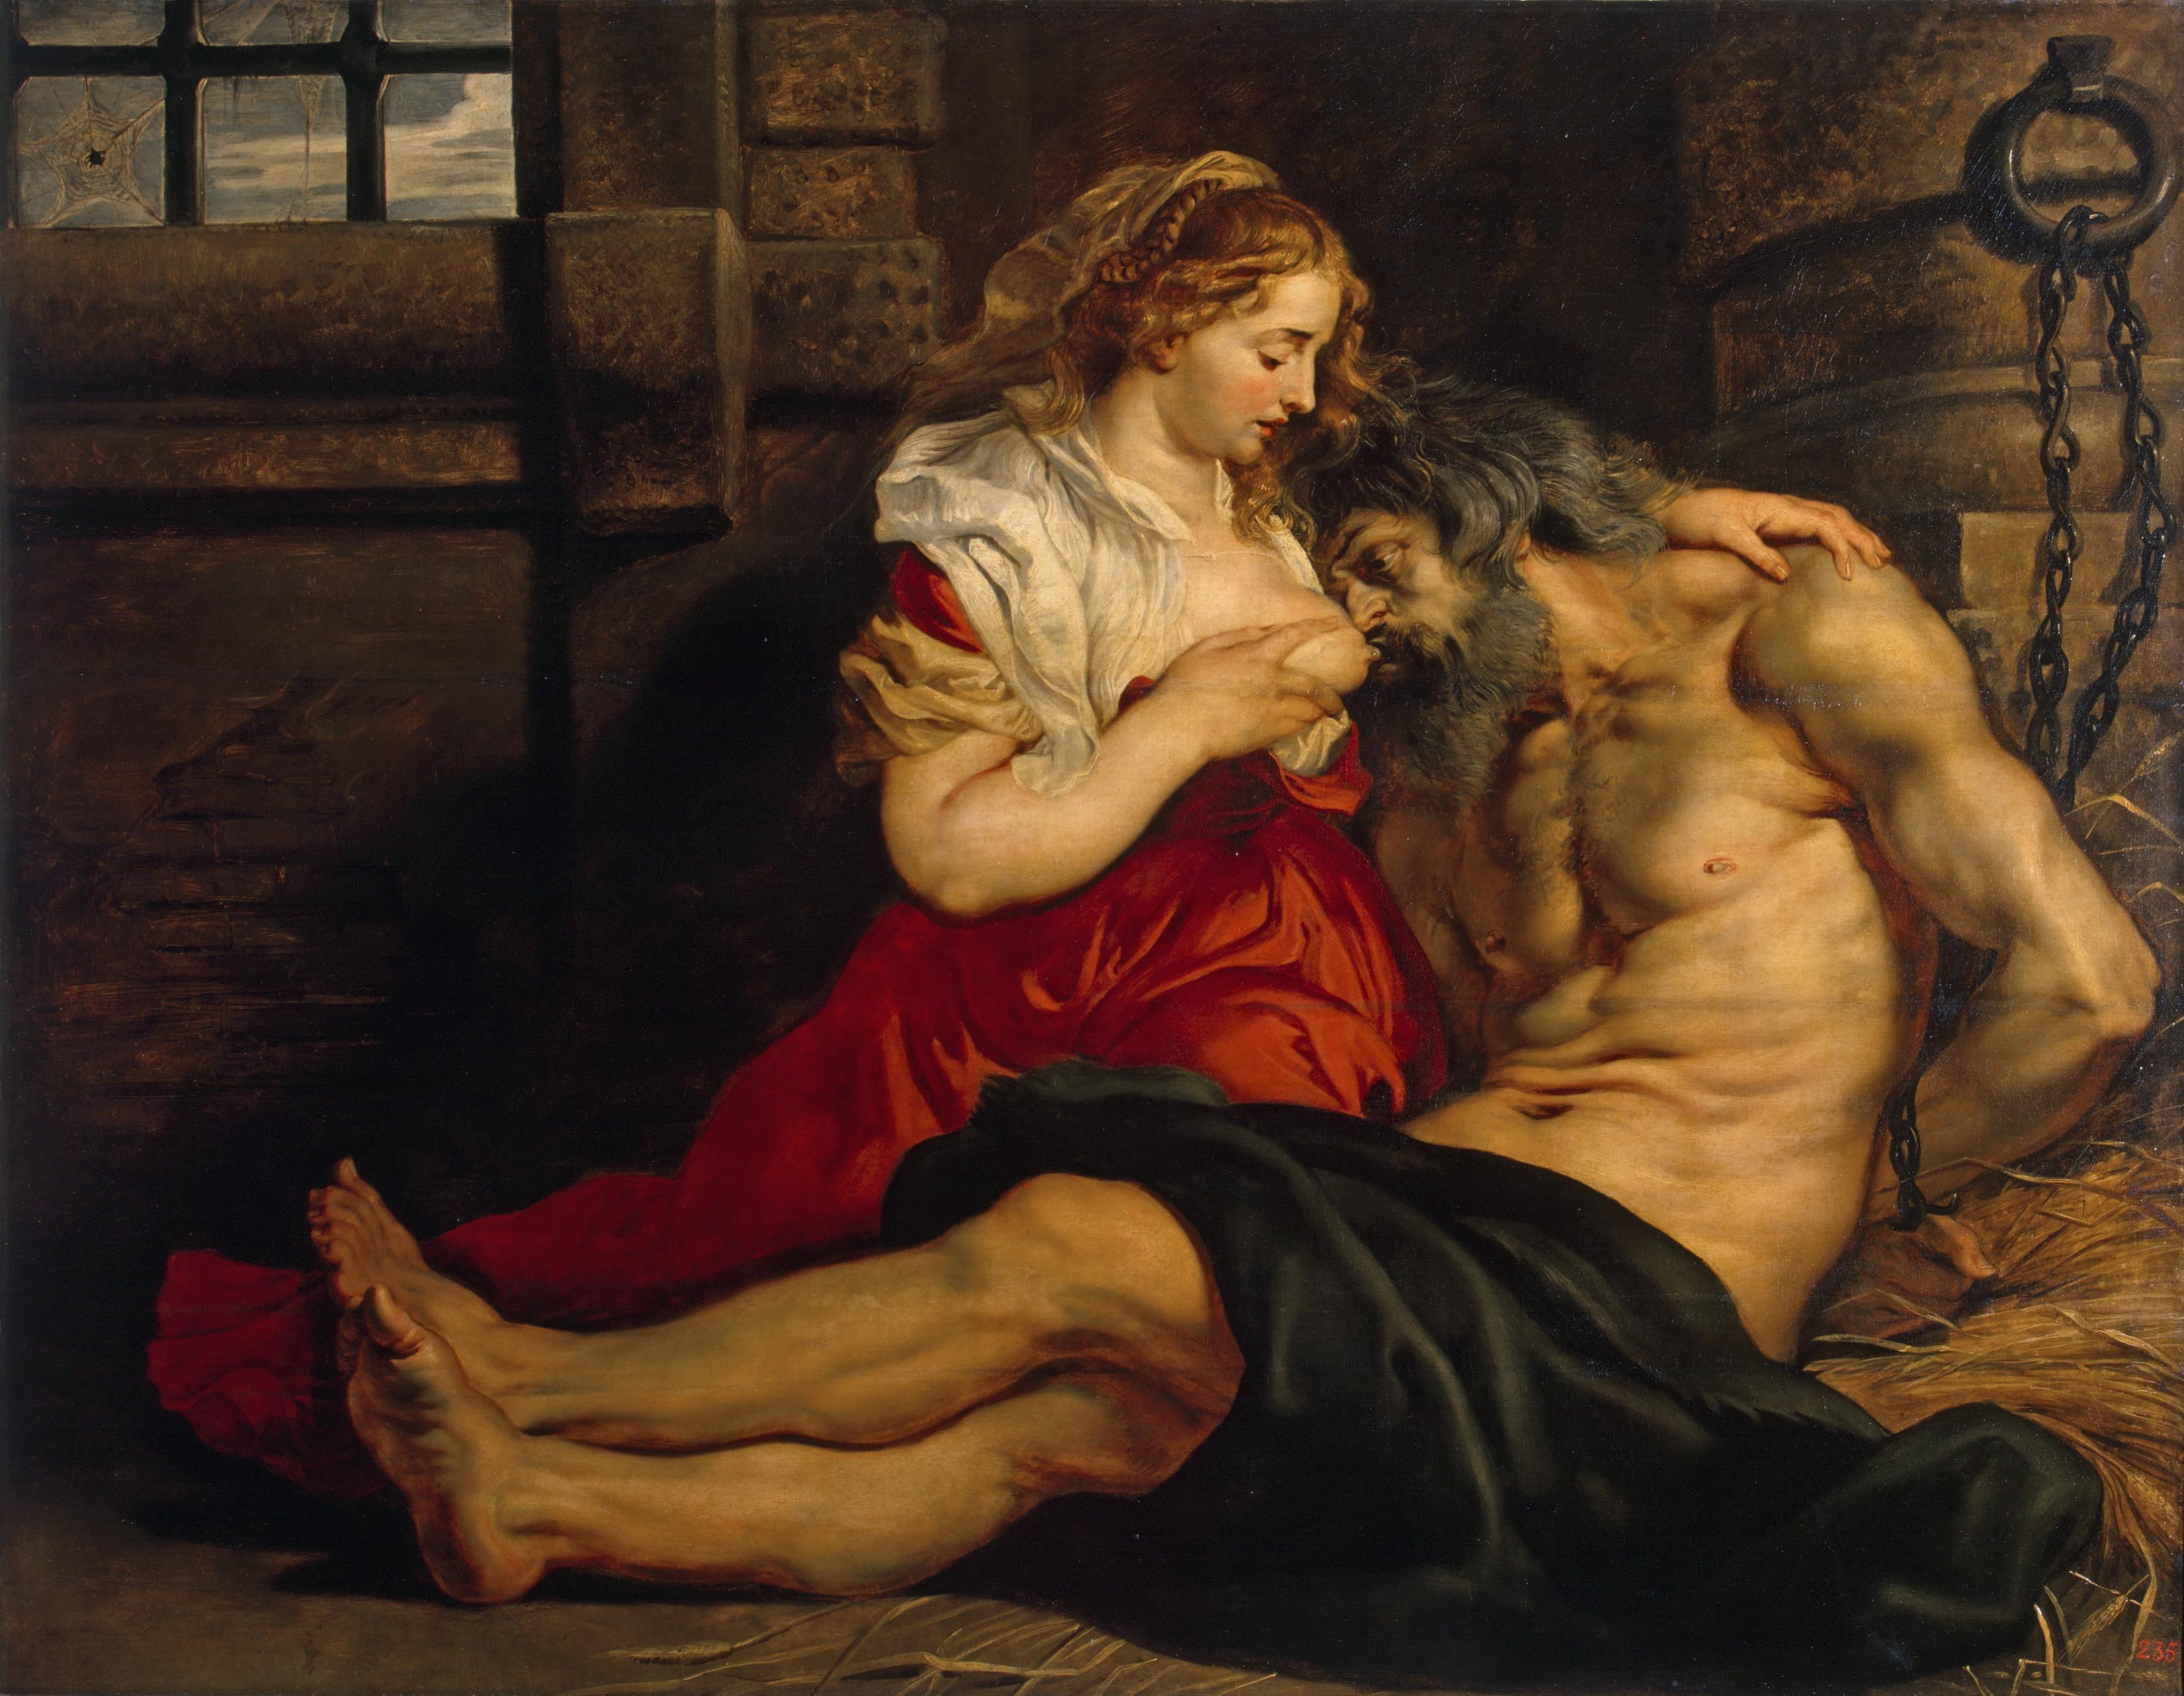 La caridad romana.